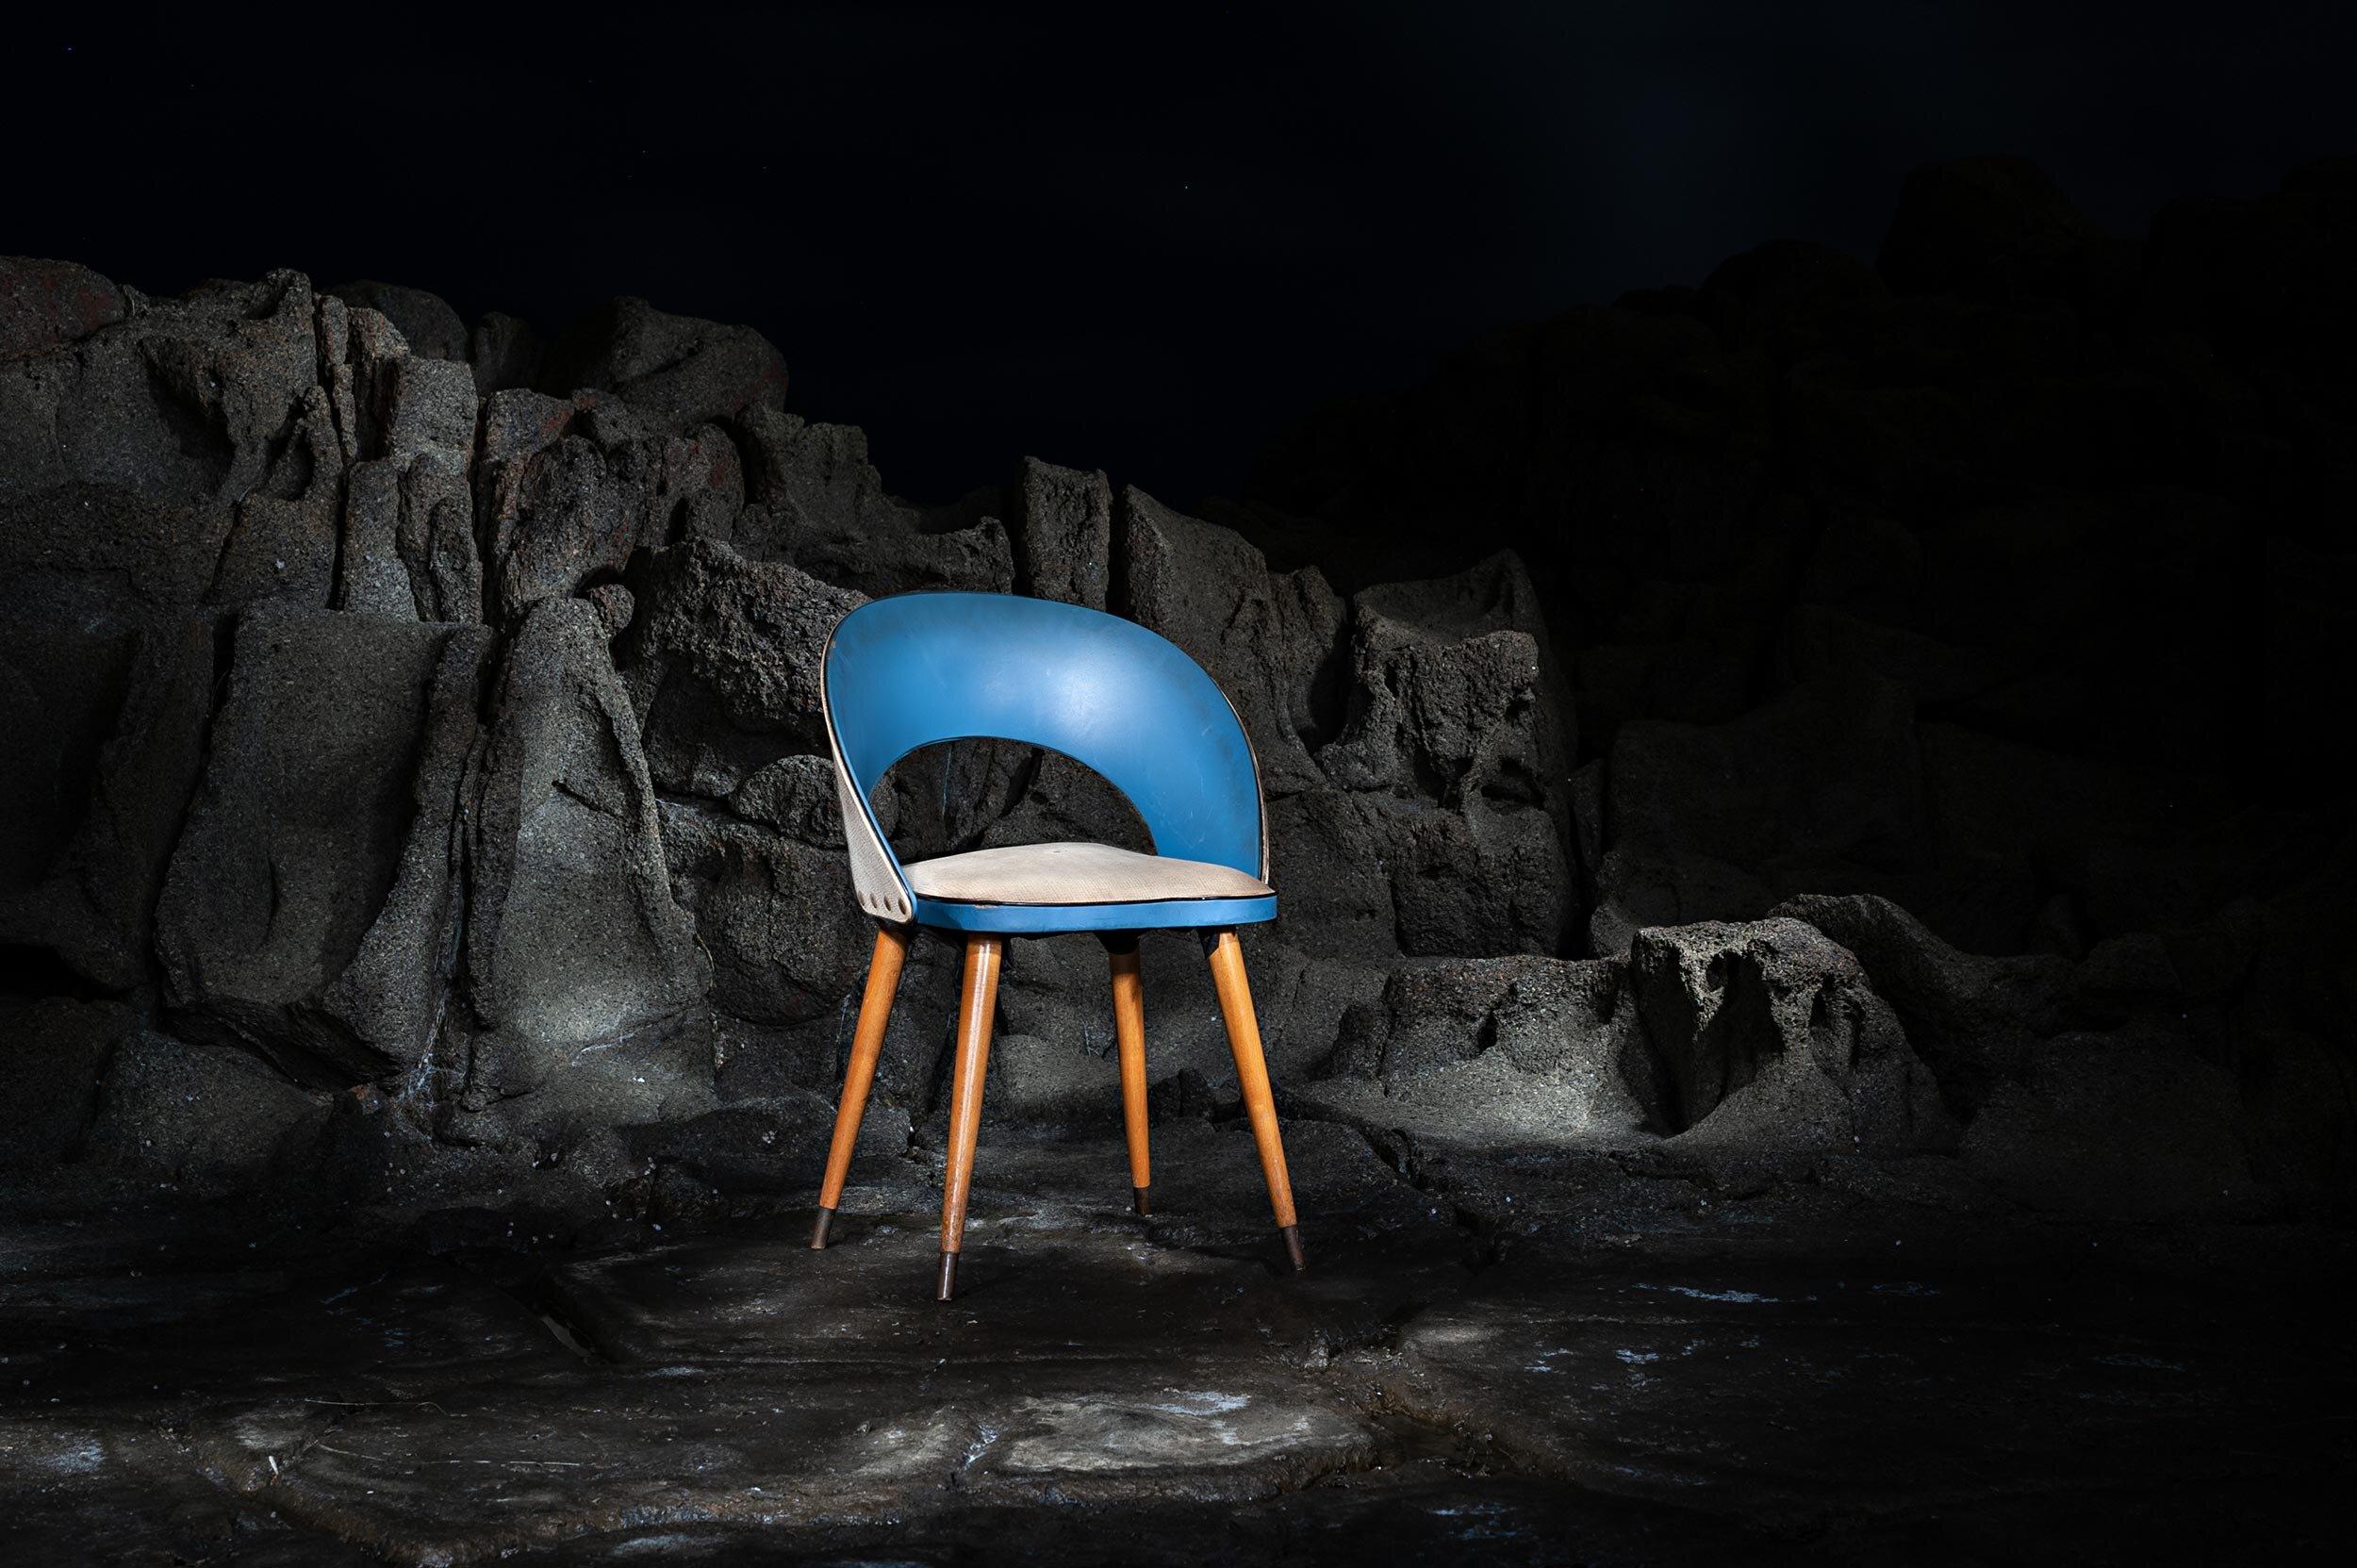 1950s chair_light painting_LR.jpg